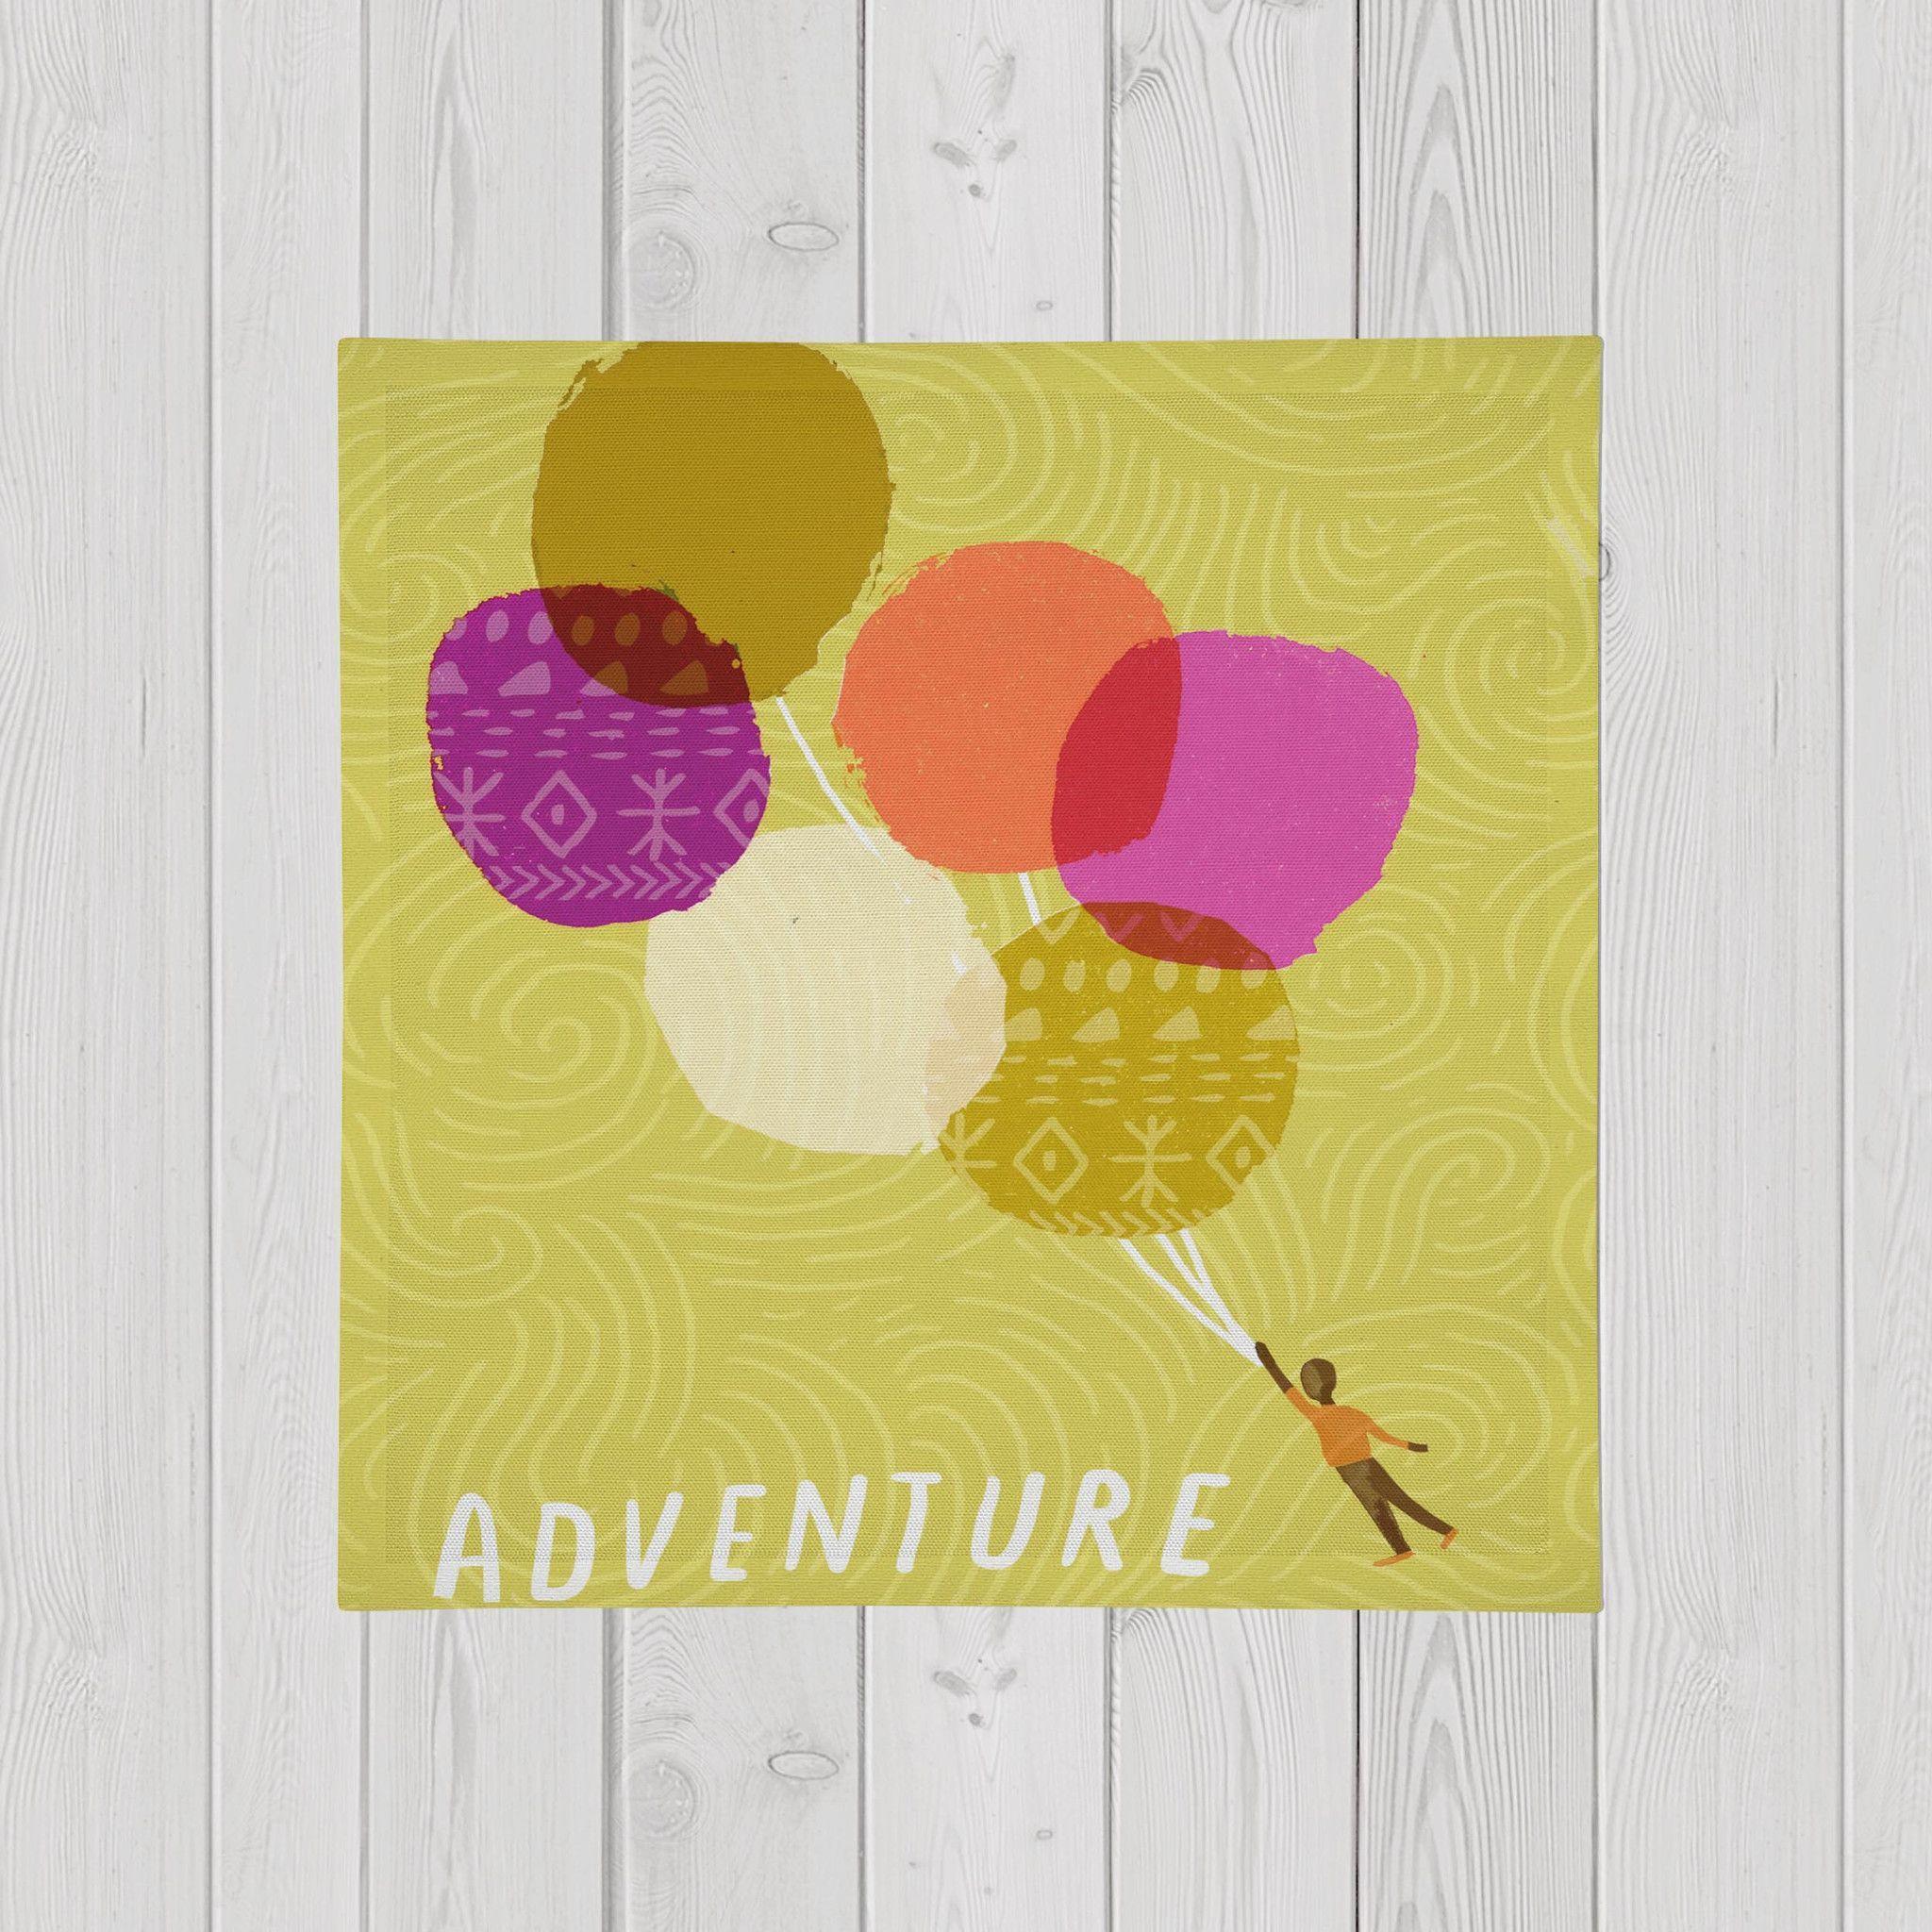 'Adventure' balloons